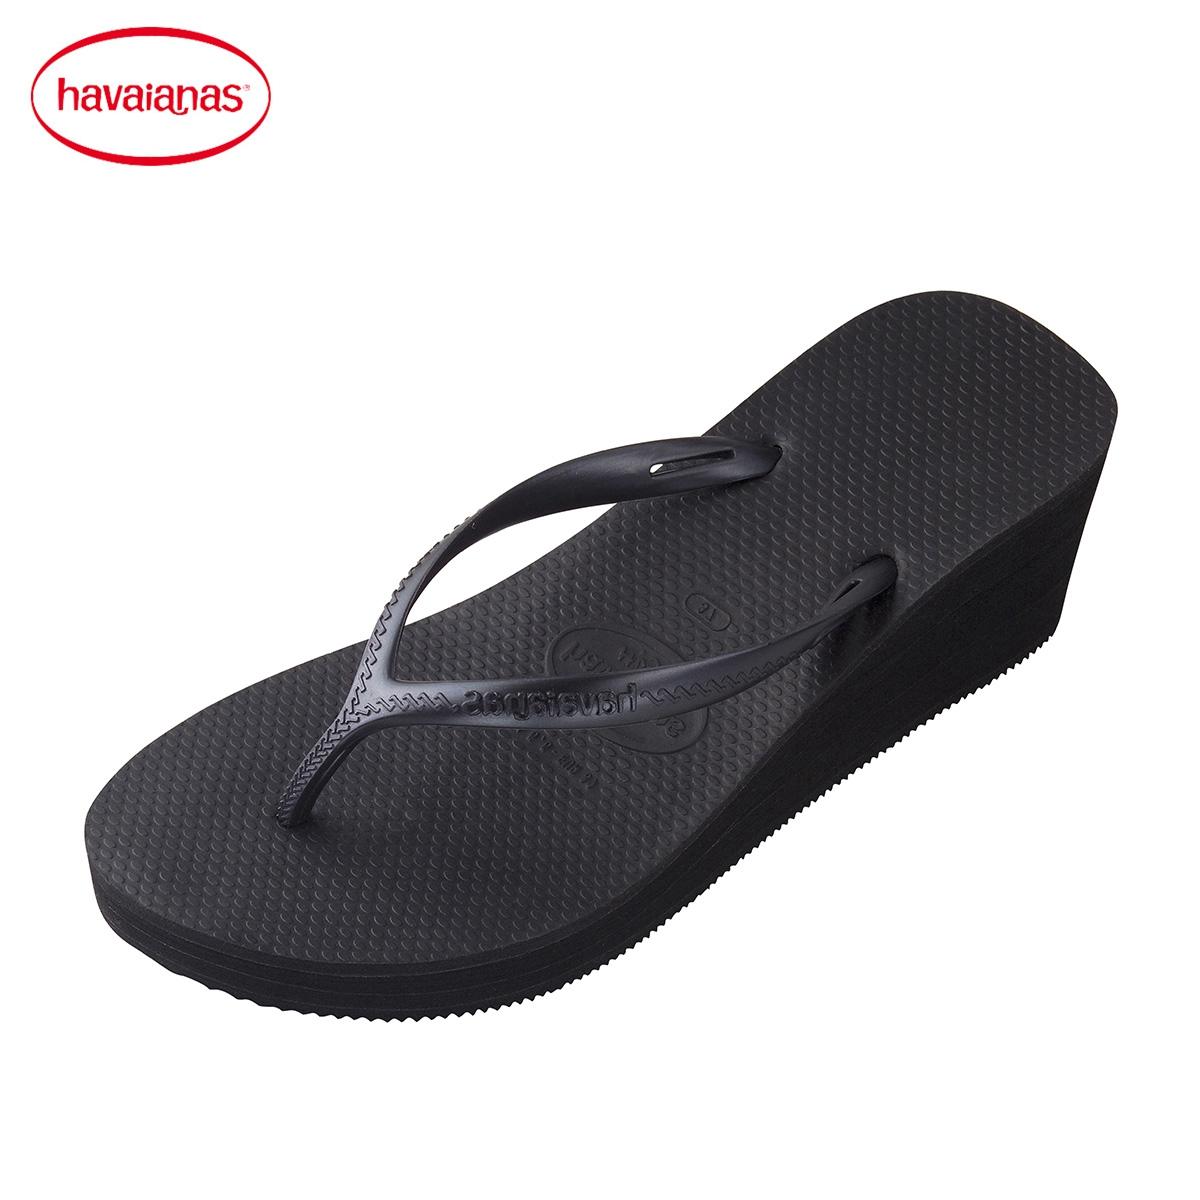 Havaianas Lereng Tebal-Bawah With Sandal Jepit/Warna Polos (Hitam) (Hitam)